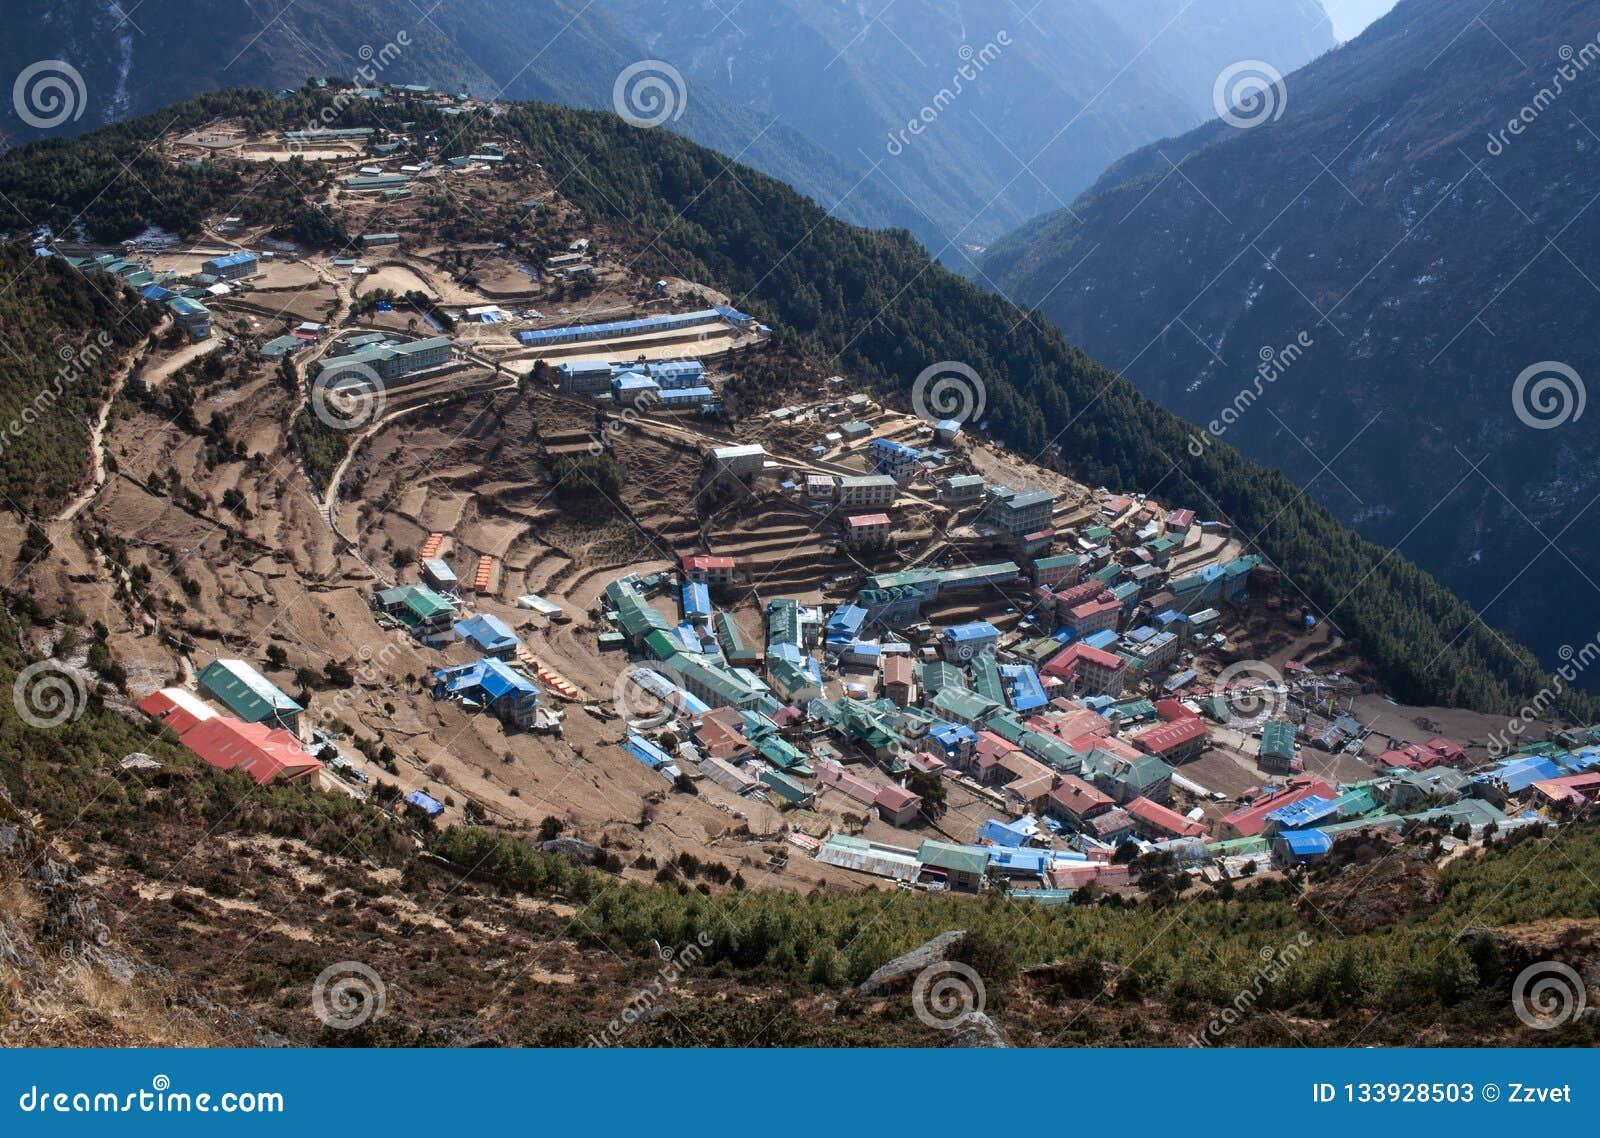 Namche Bazaar View From Above In Sagarmatha National Park, Nepal